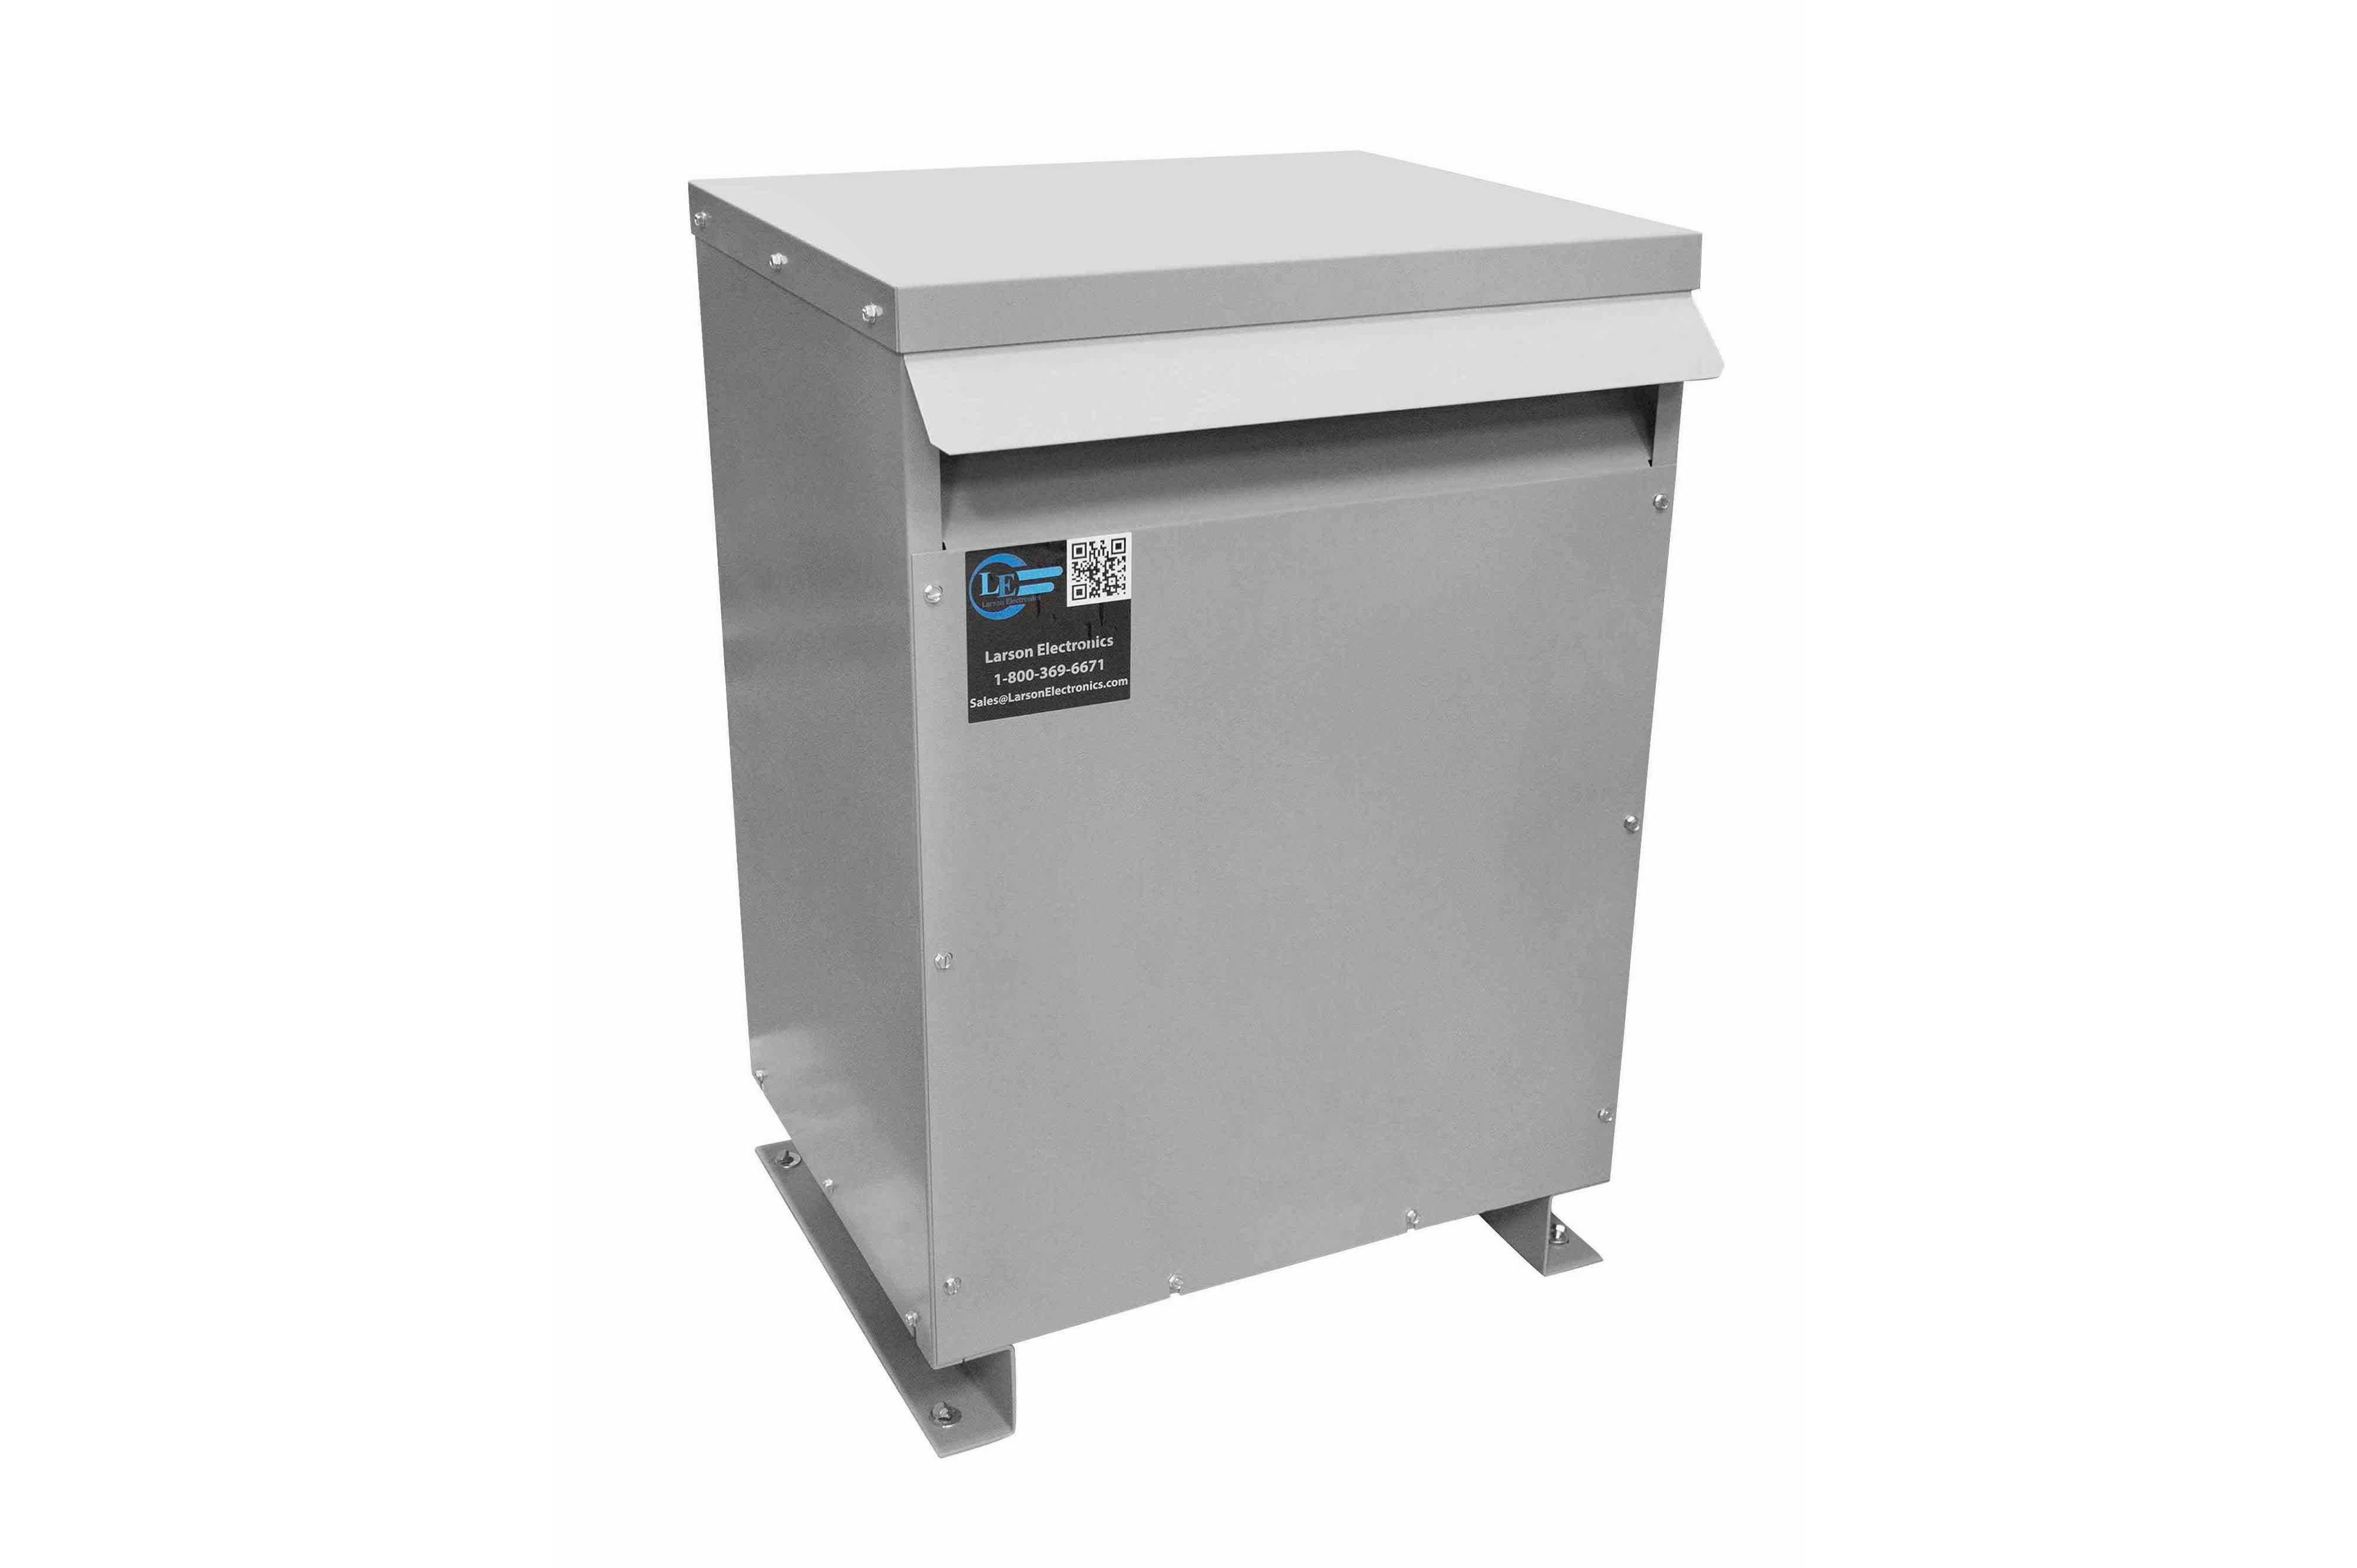 12 kVA 3PH Isolation Transformer, 460V Wye Primary, 380V Delta Secondary, N3R, Ventilated, 60 Hz